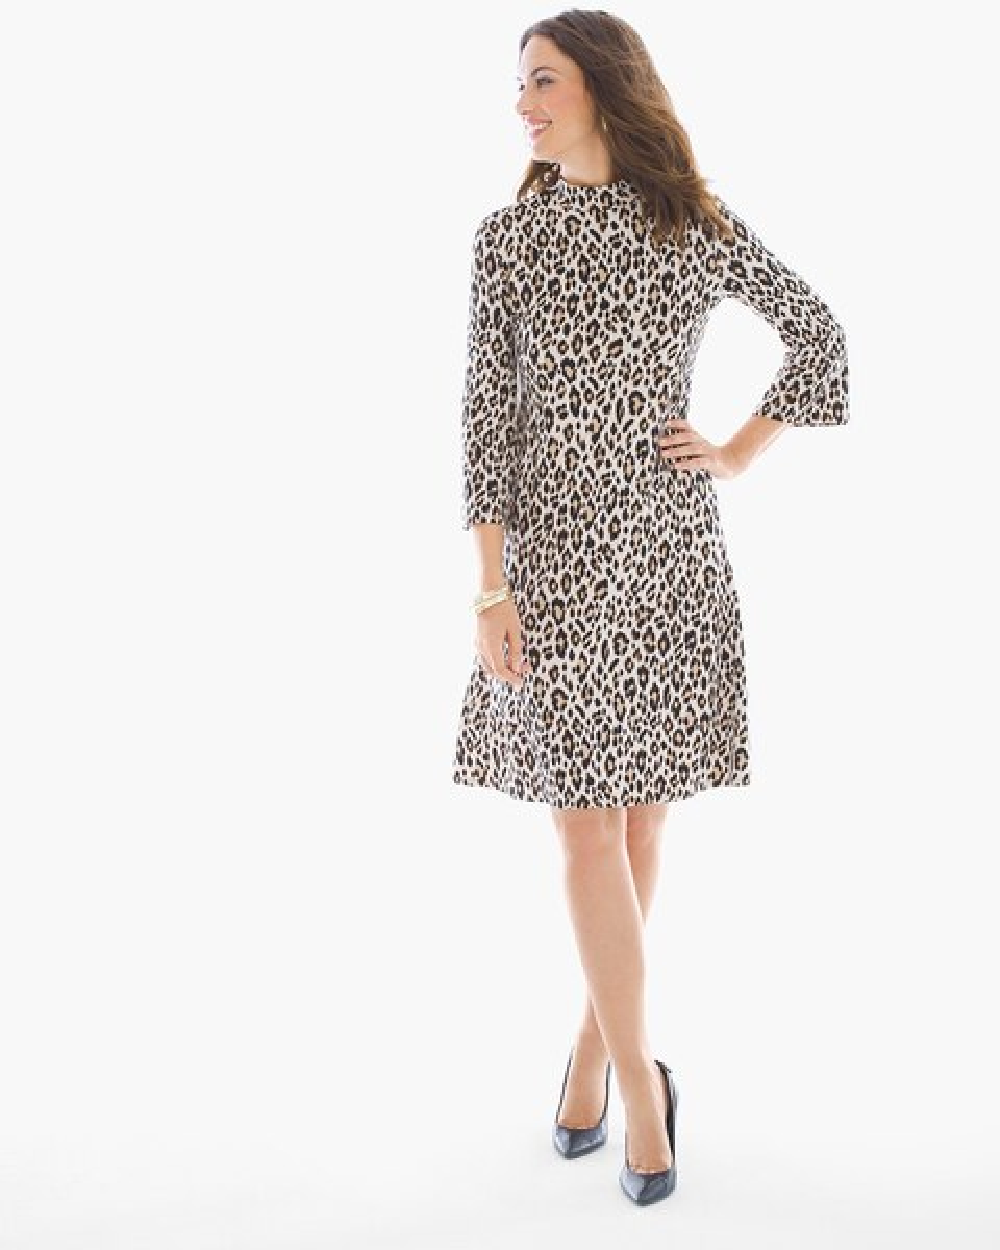 664b91a276 Return to thumbnail image selection Leopard-Print Mock Neck Short Dress  video preview image